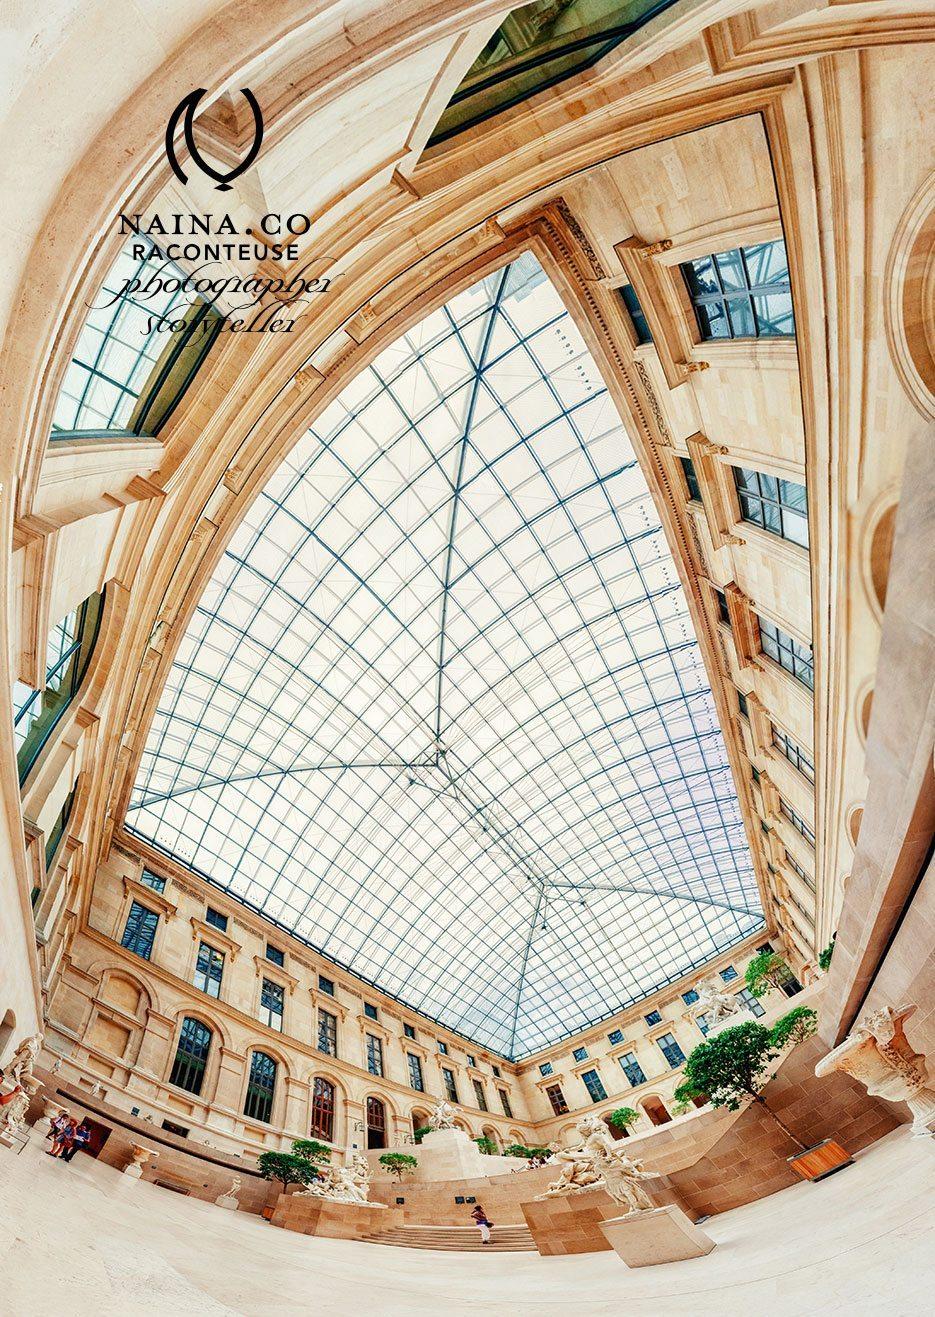 Naina.co-Louvre-Museum-Paris-France-EyesForParis-Raconteuse-Storyteller-Photographer-Blogger-Luxury-Lifestyle-072